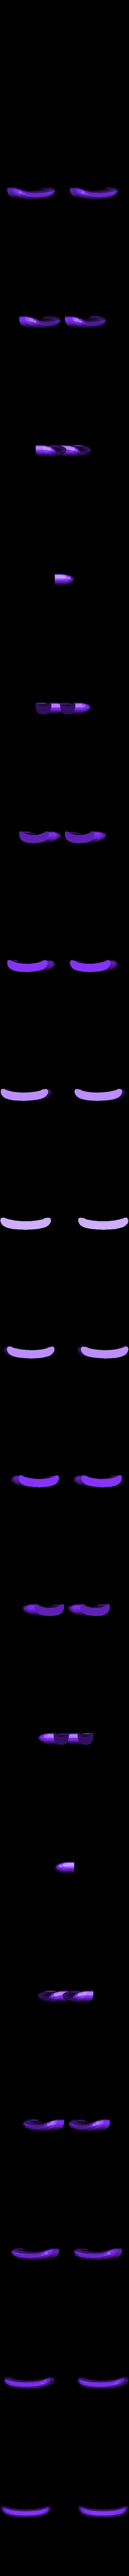 eye_lashes.stl Download free STL file The Caterpillar • 3D print model, reddadsteve